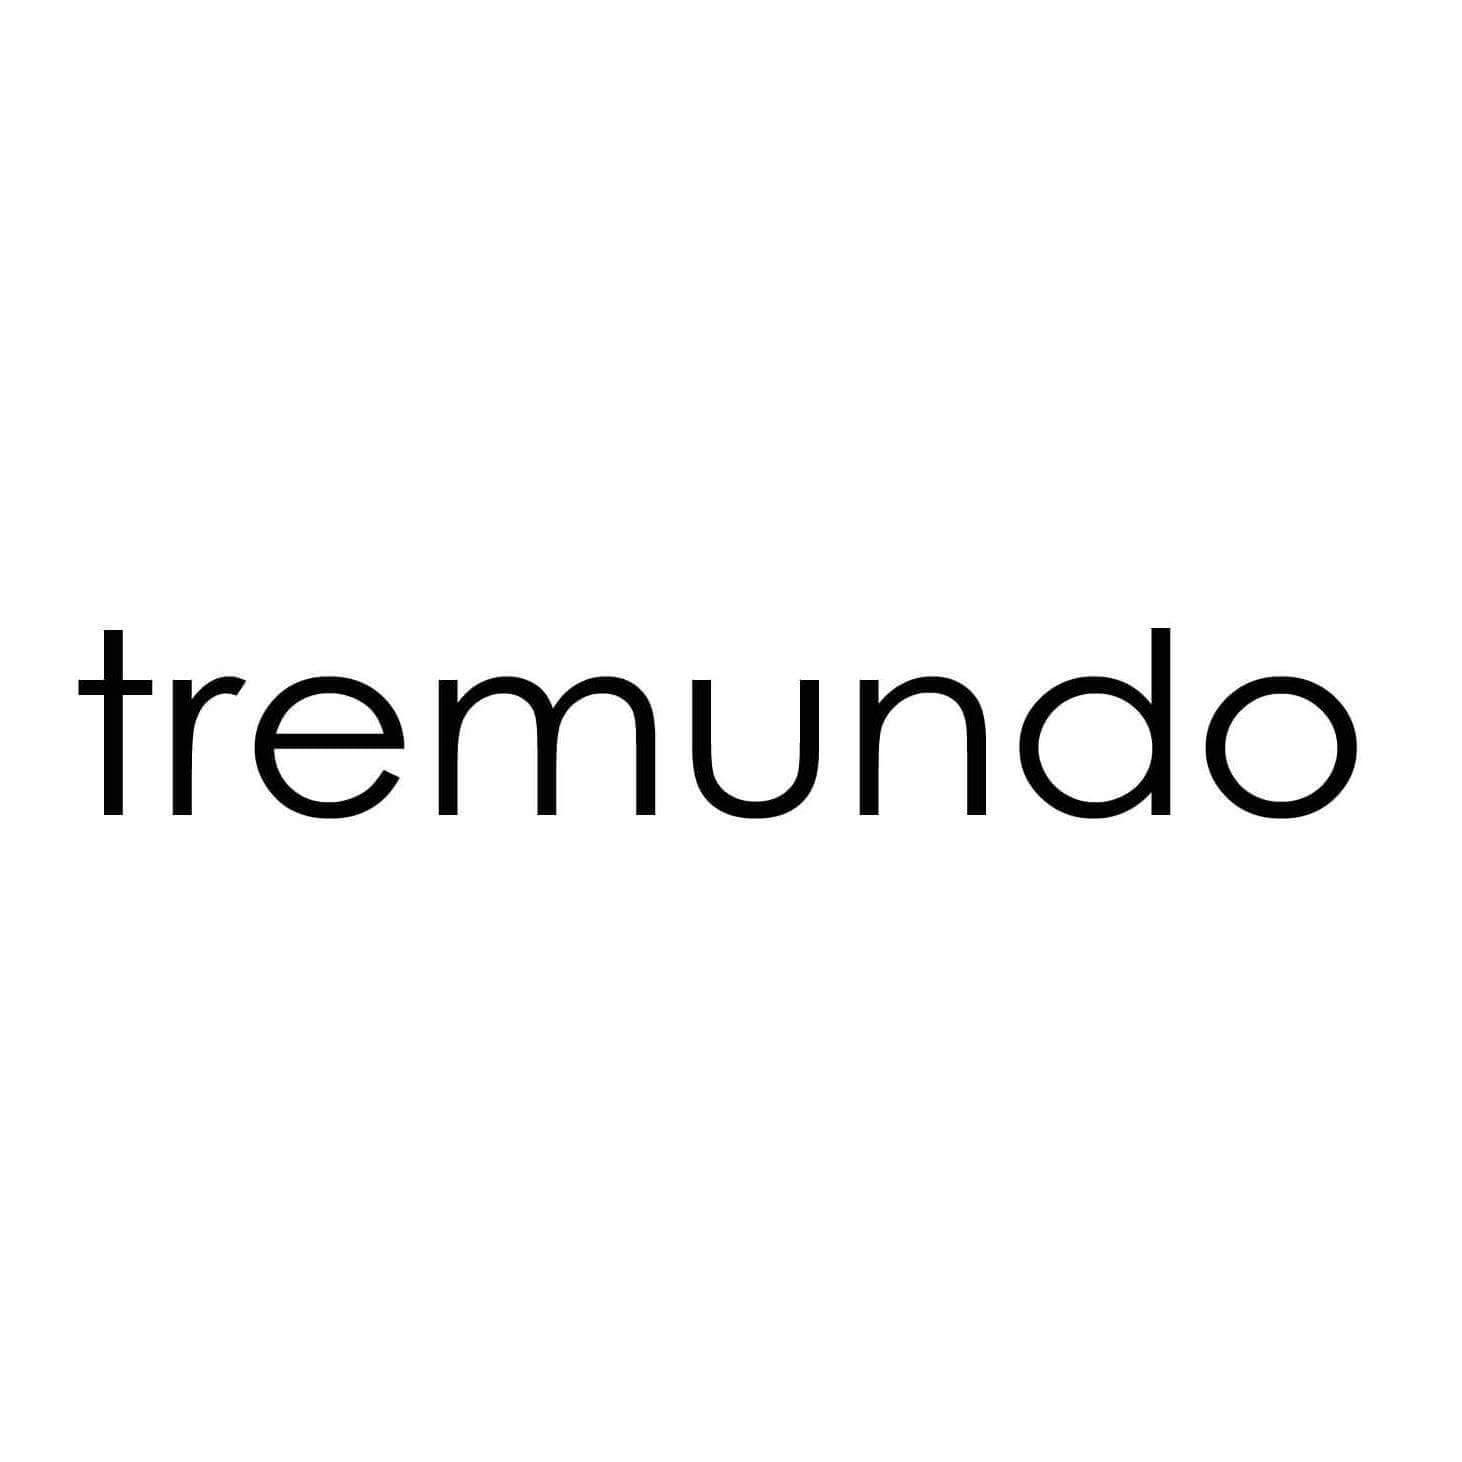 TremundoJournals